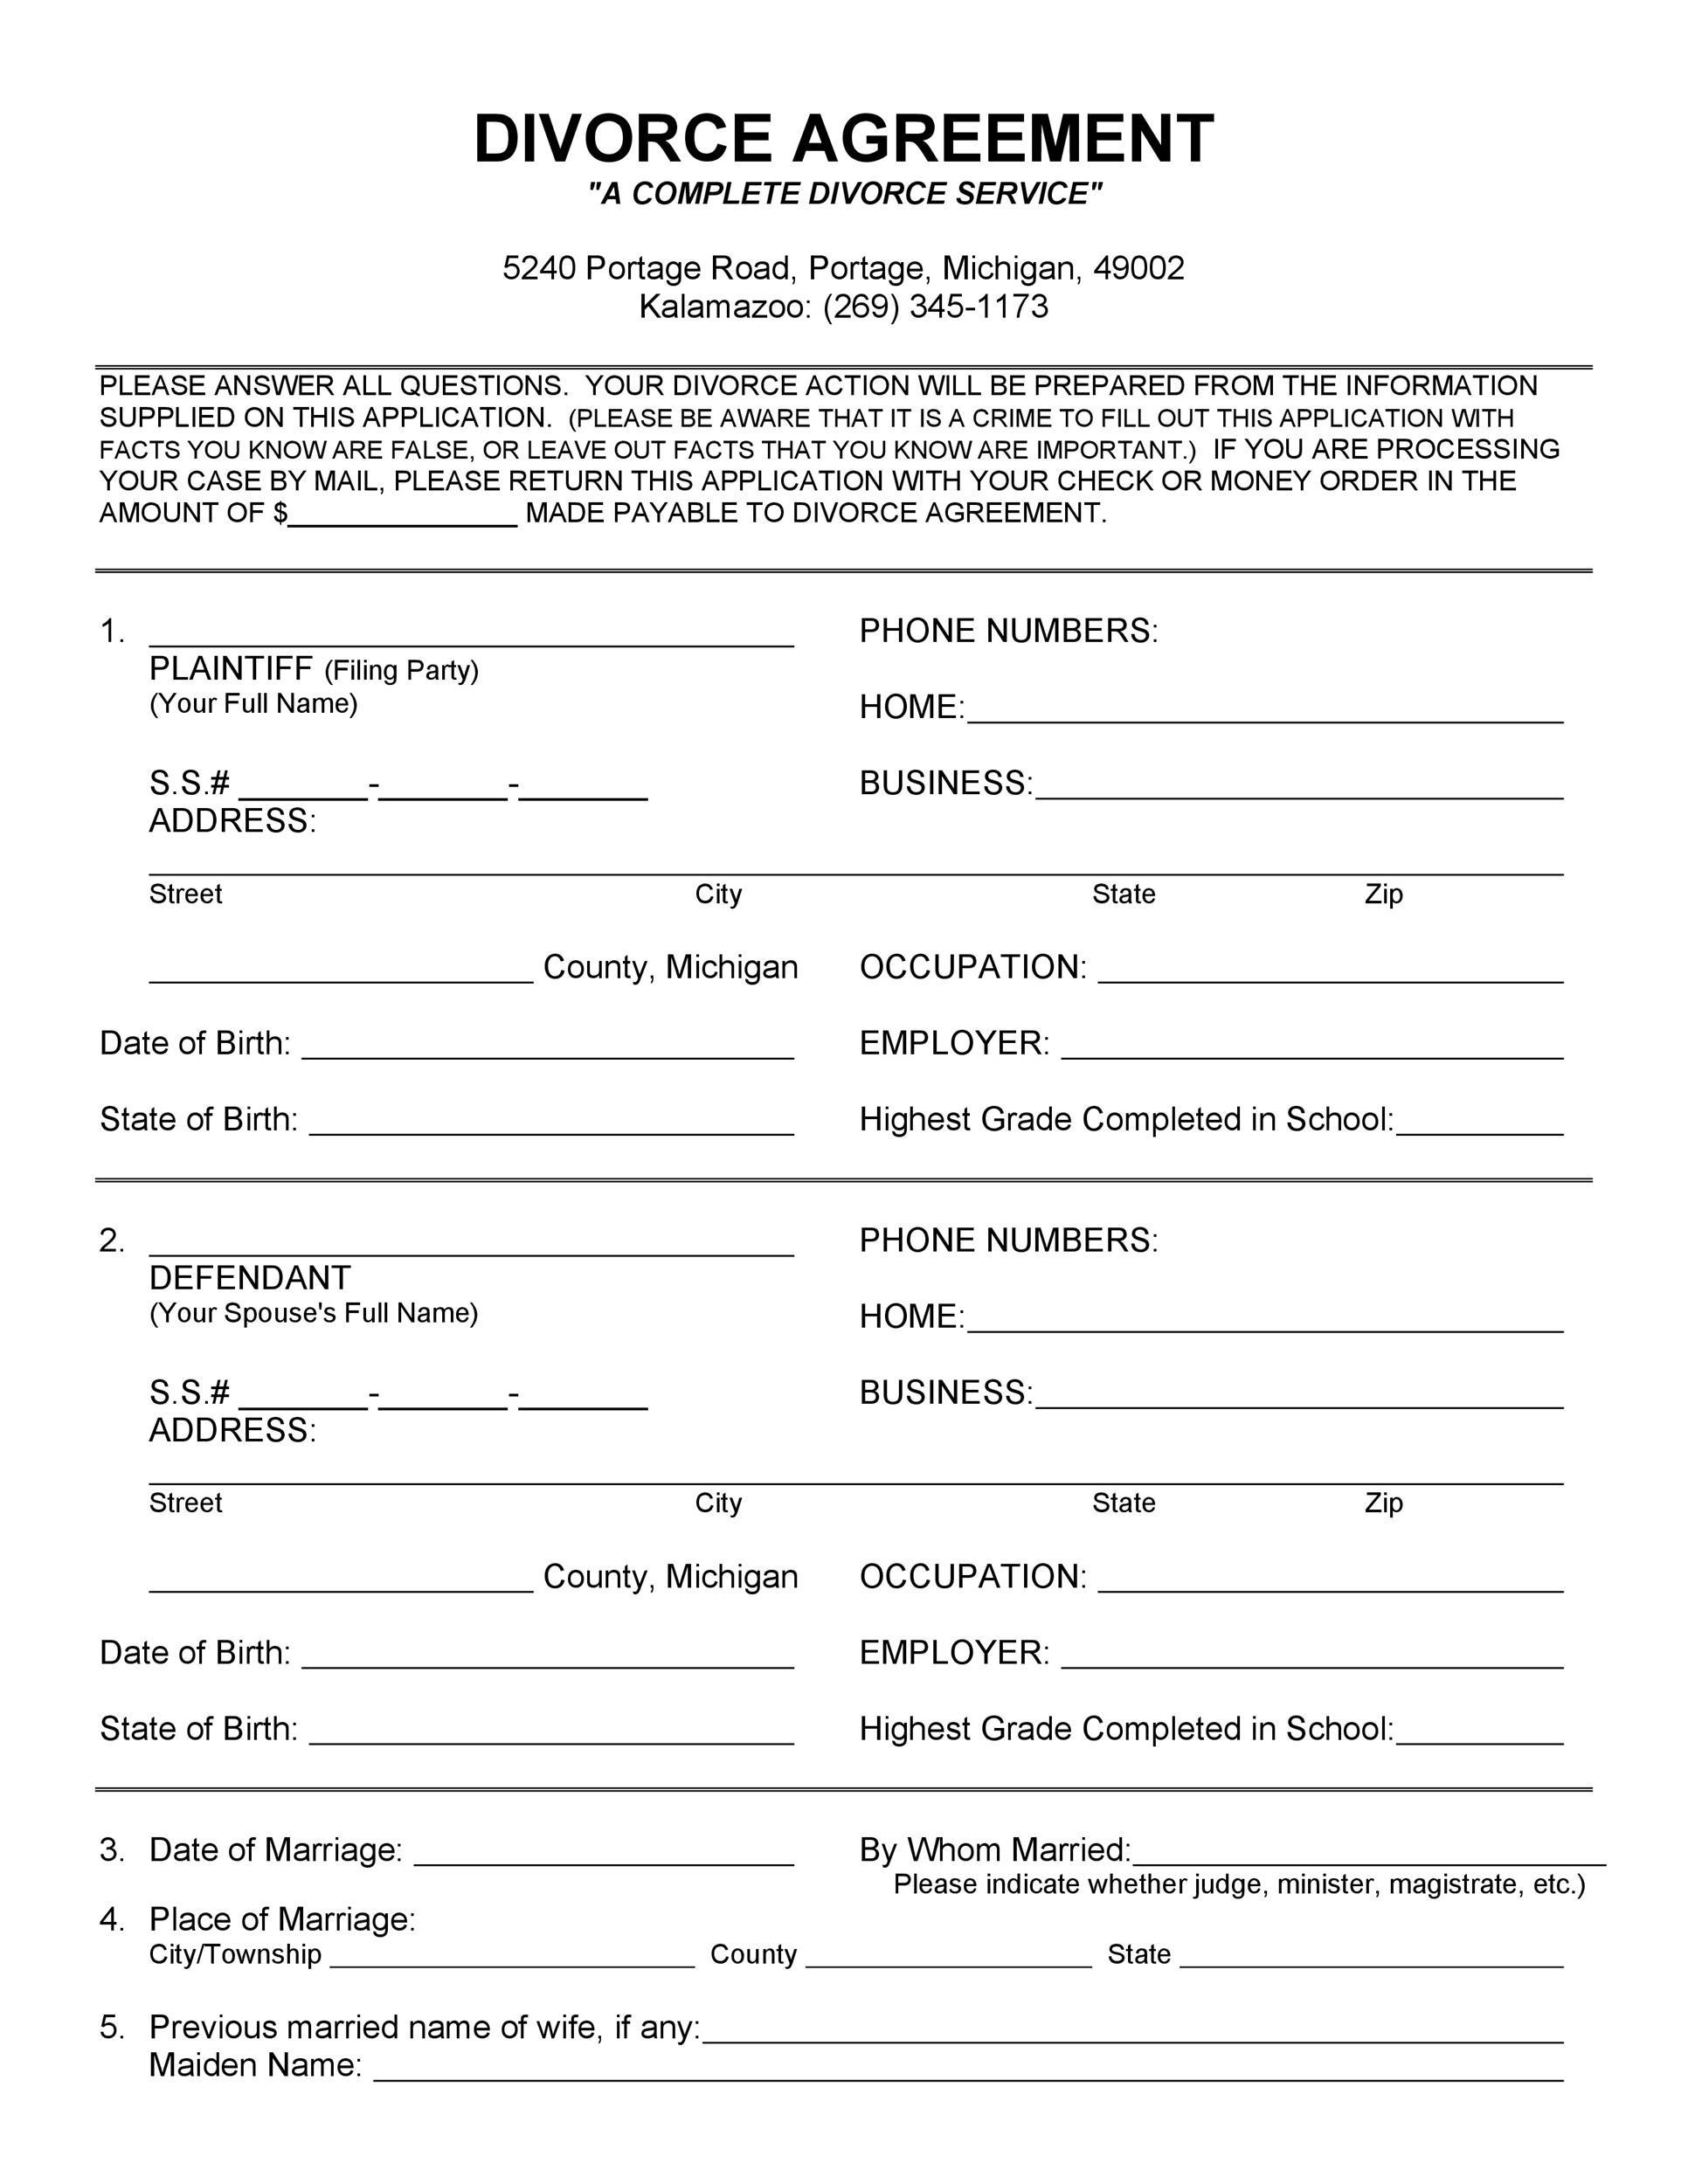 Free divorce agreement 03